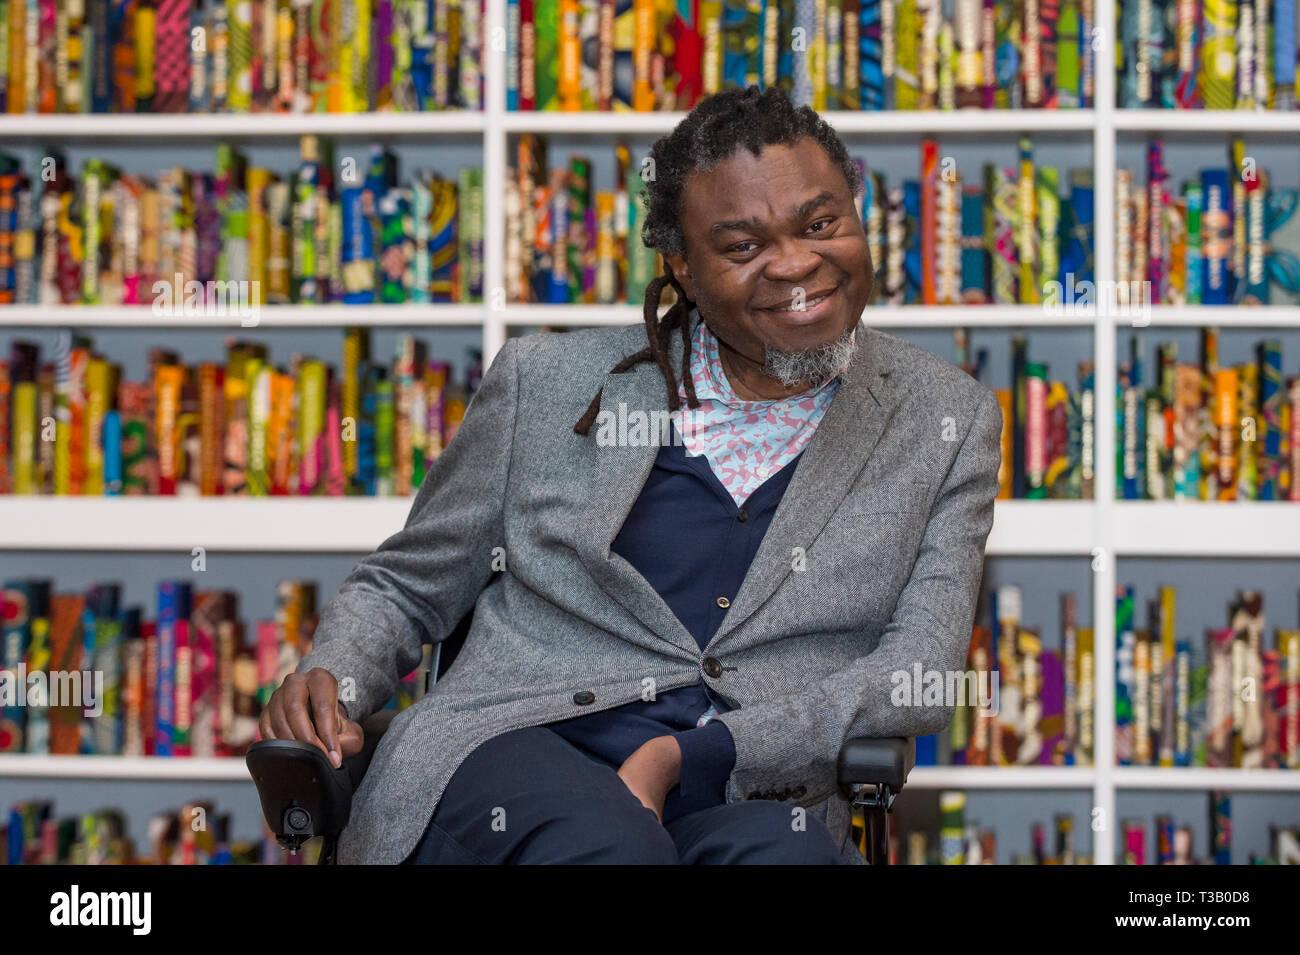 Nigeria Artist Stock Photos & Nigeria Artist Stock Images - Alamy